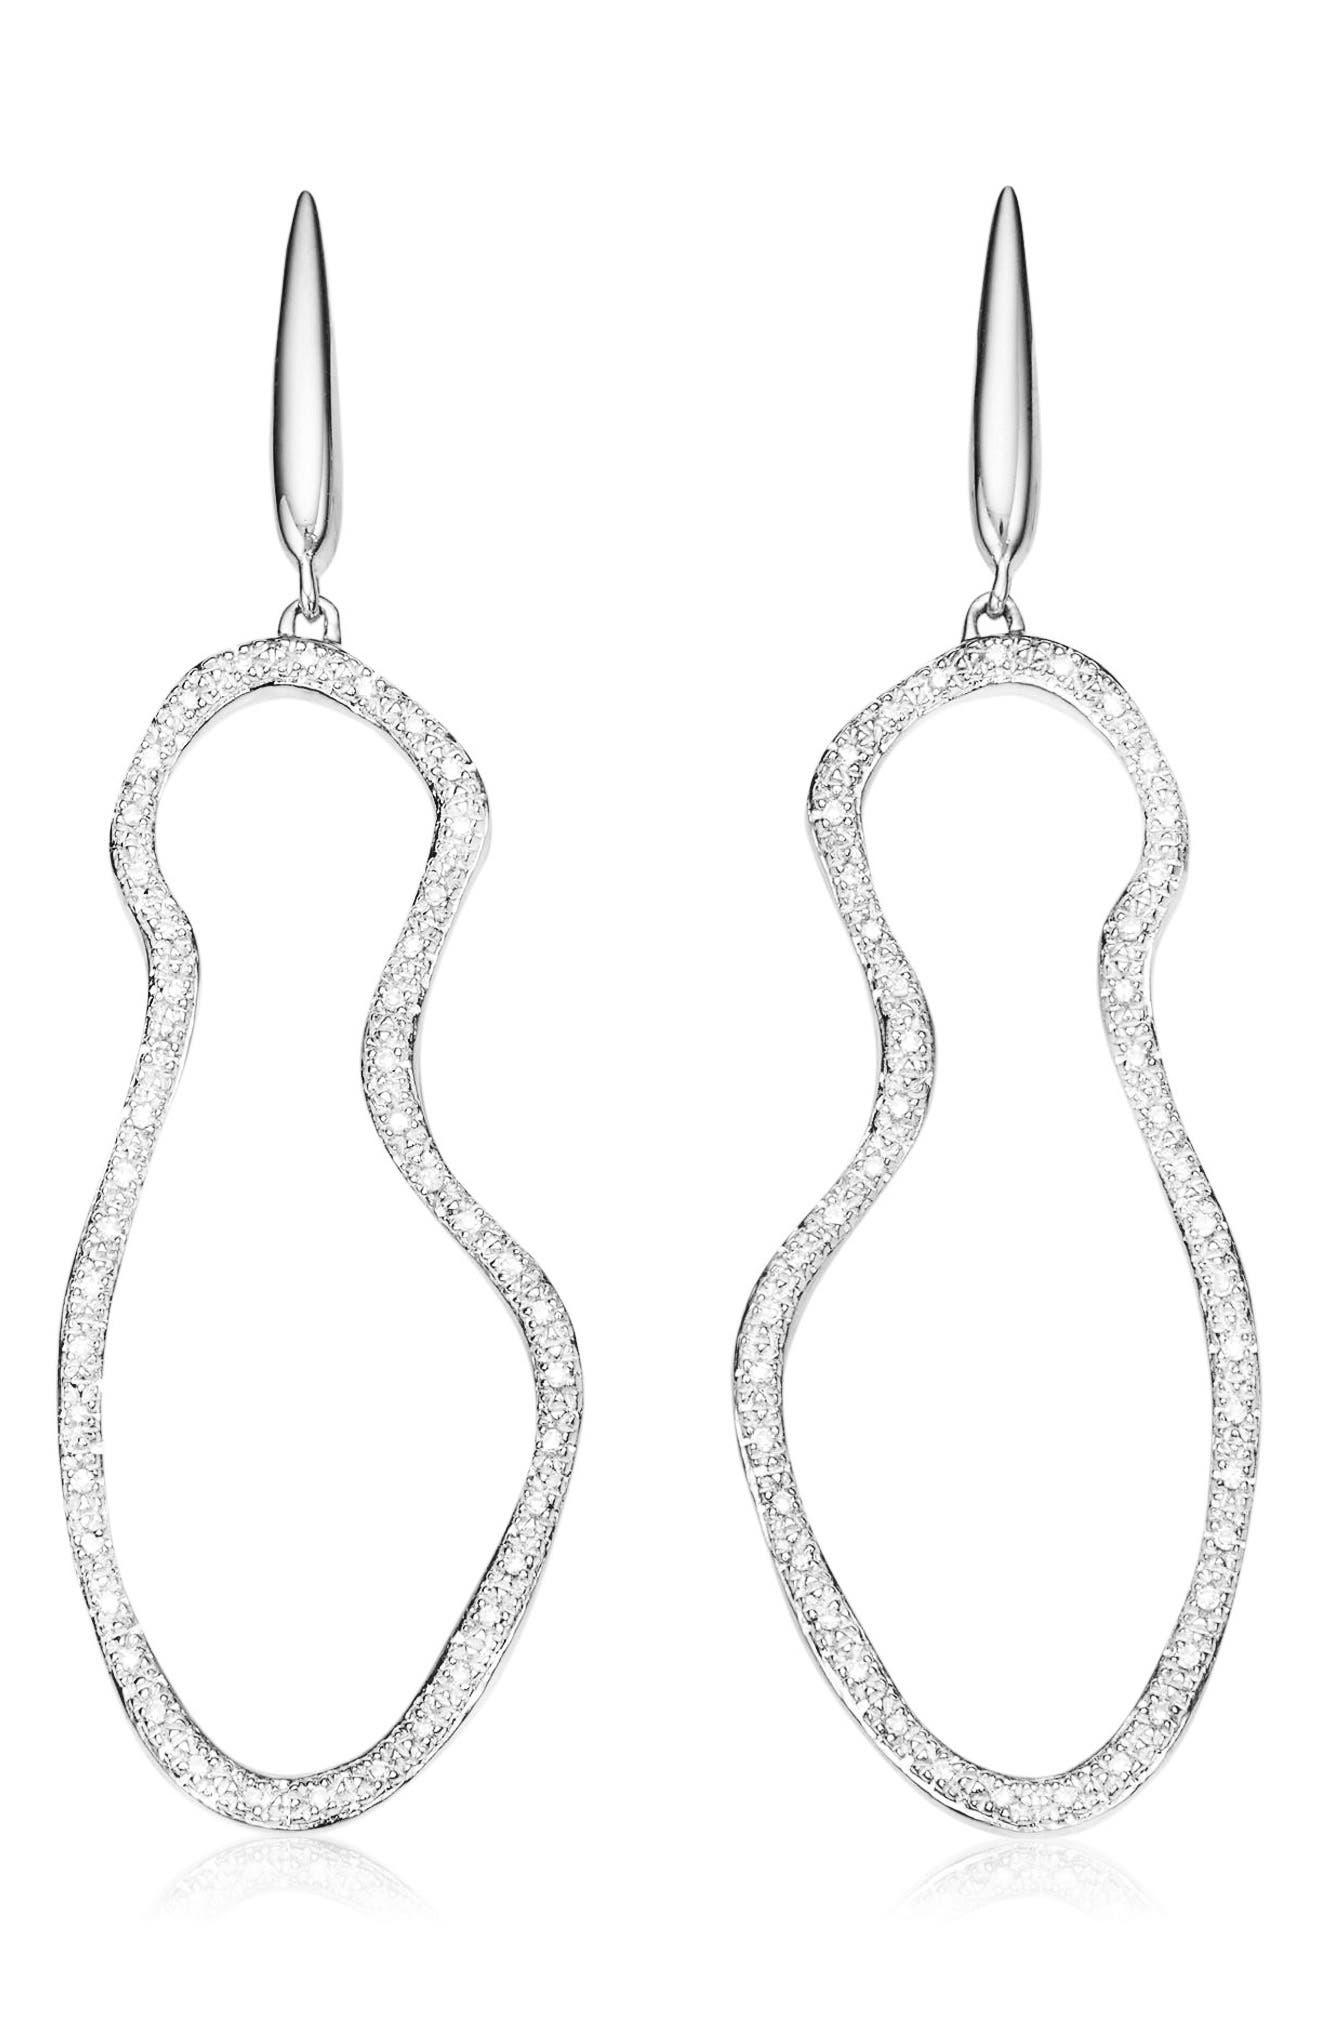 Riva Pod Diamond Cocktail Earrings,                         Main,                         color, 045